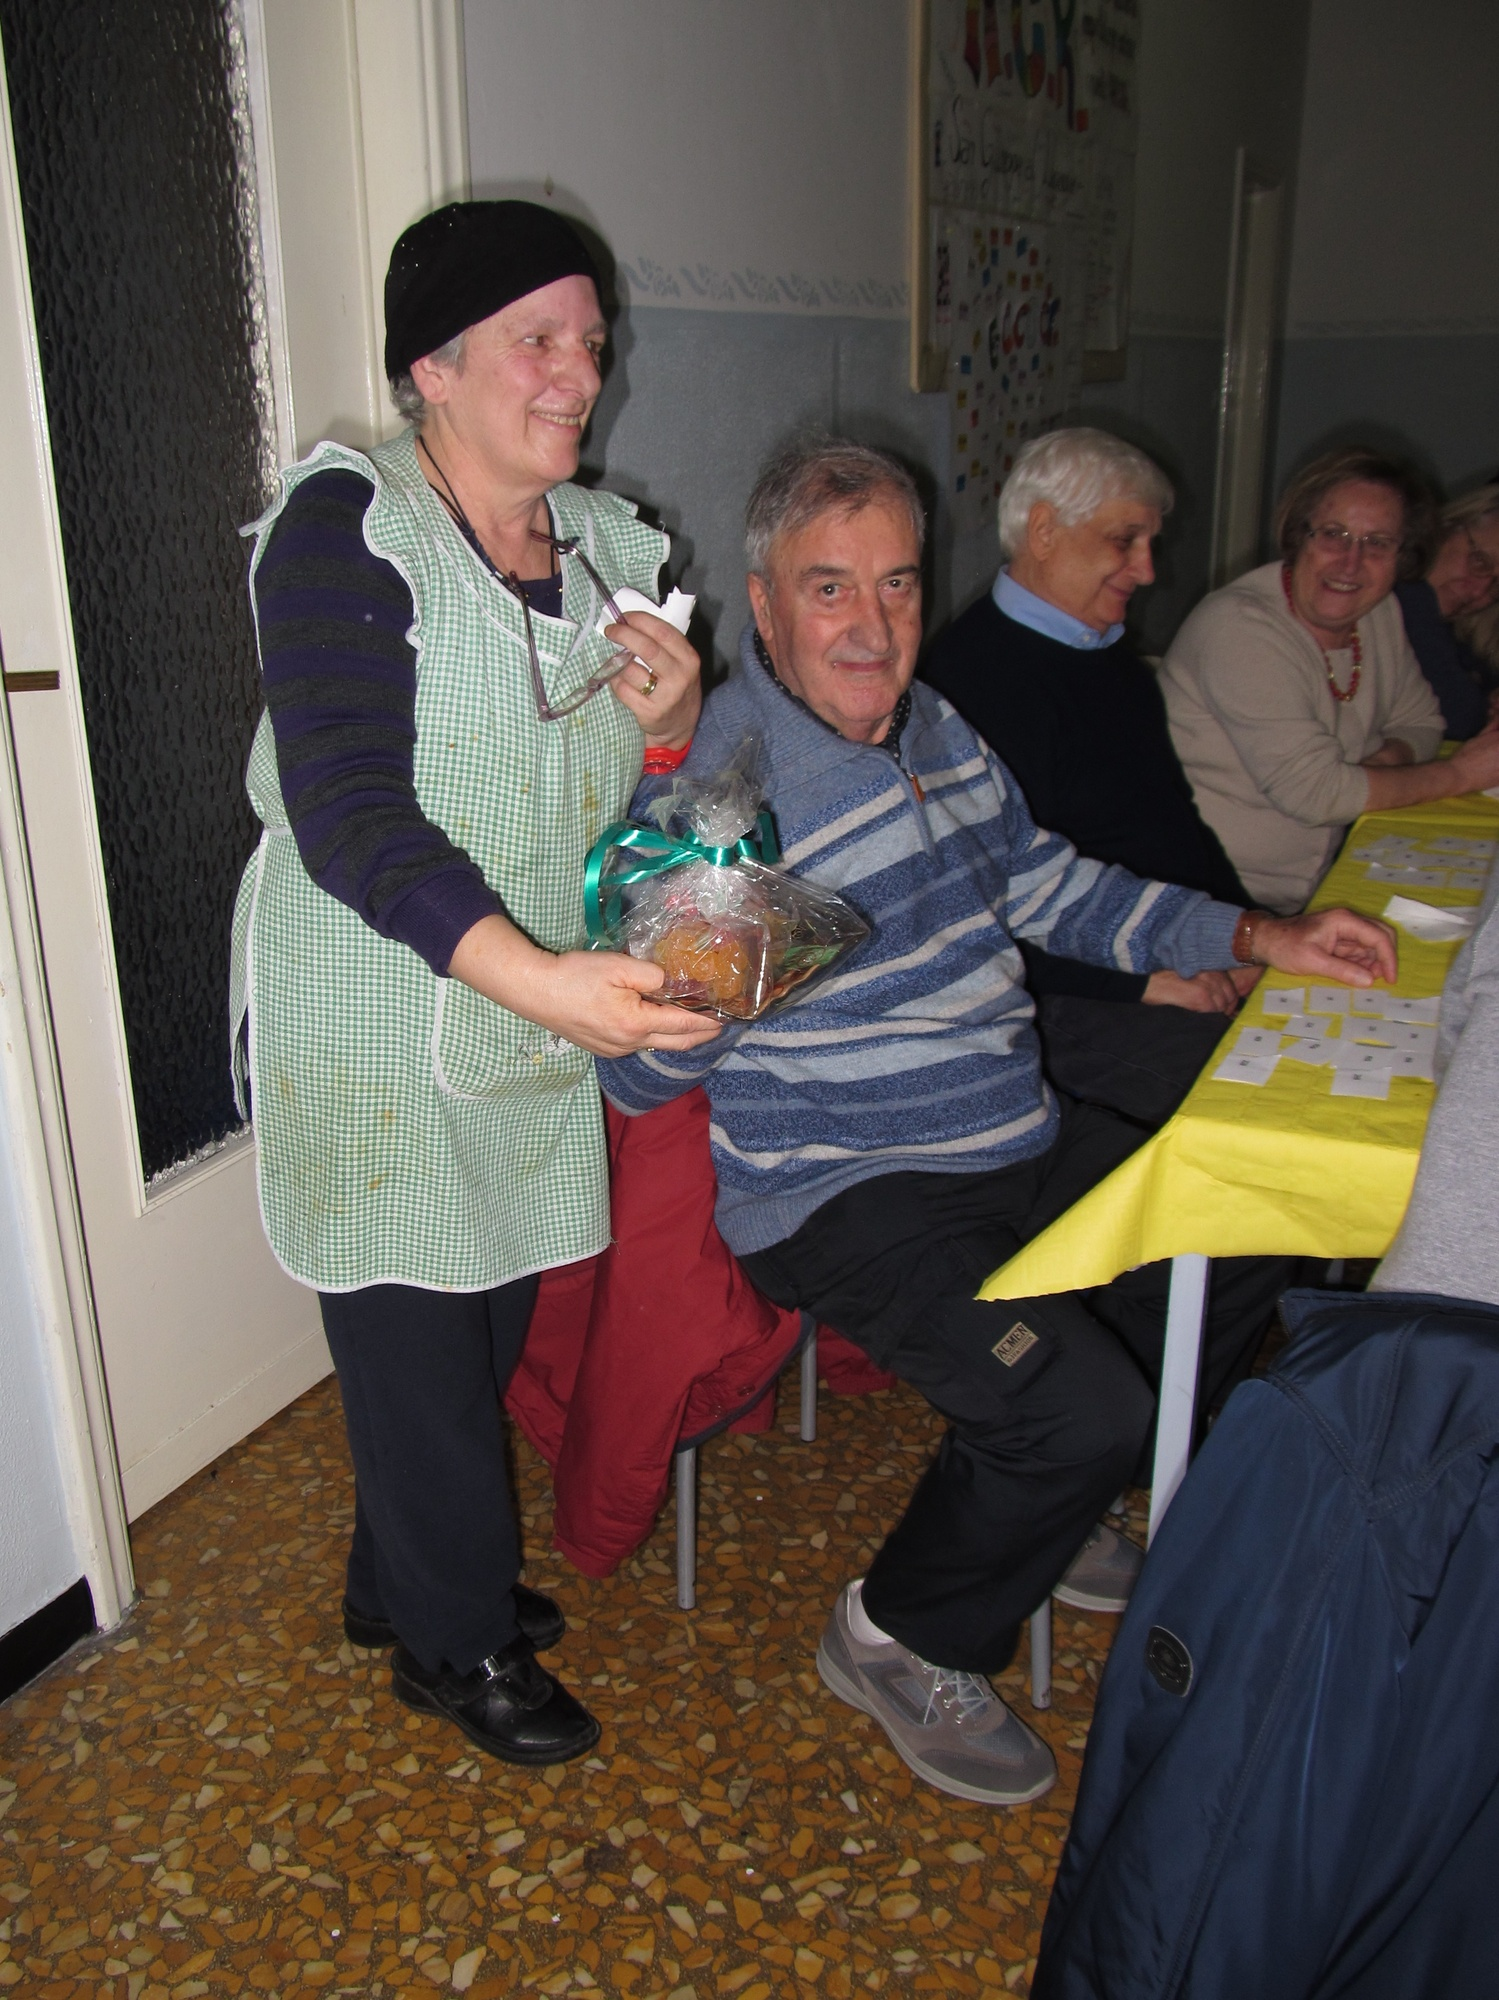 polentata-2016-02-20-21-54-04